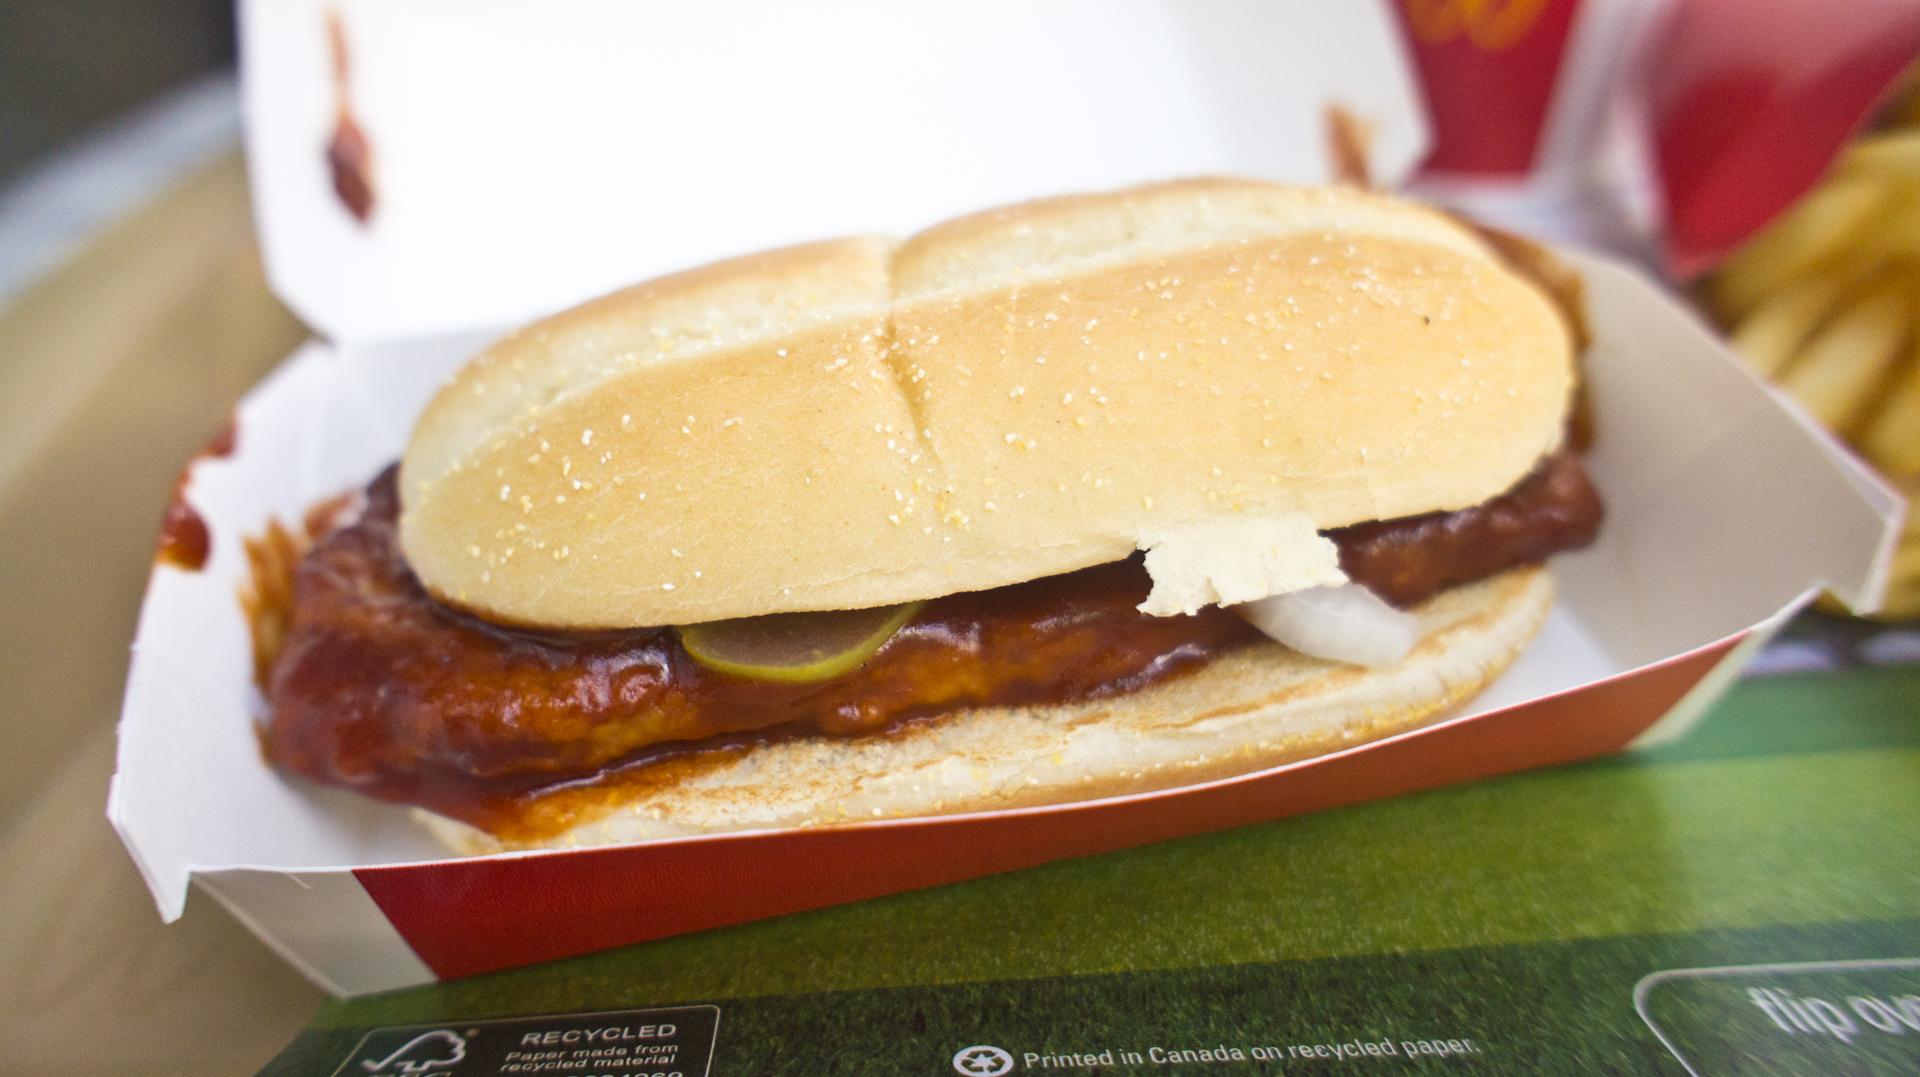 McRib sandwich in a cardboard box